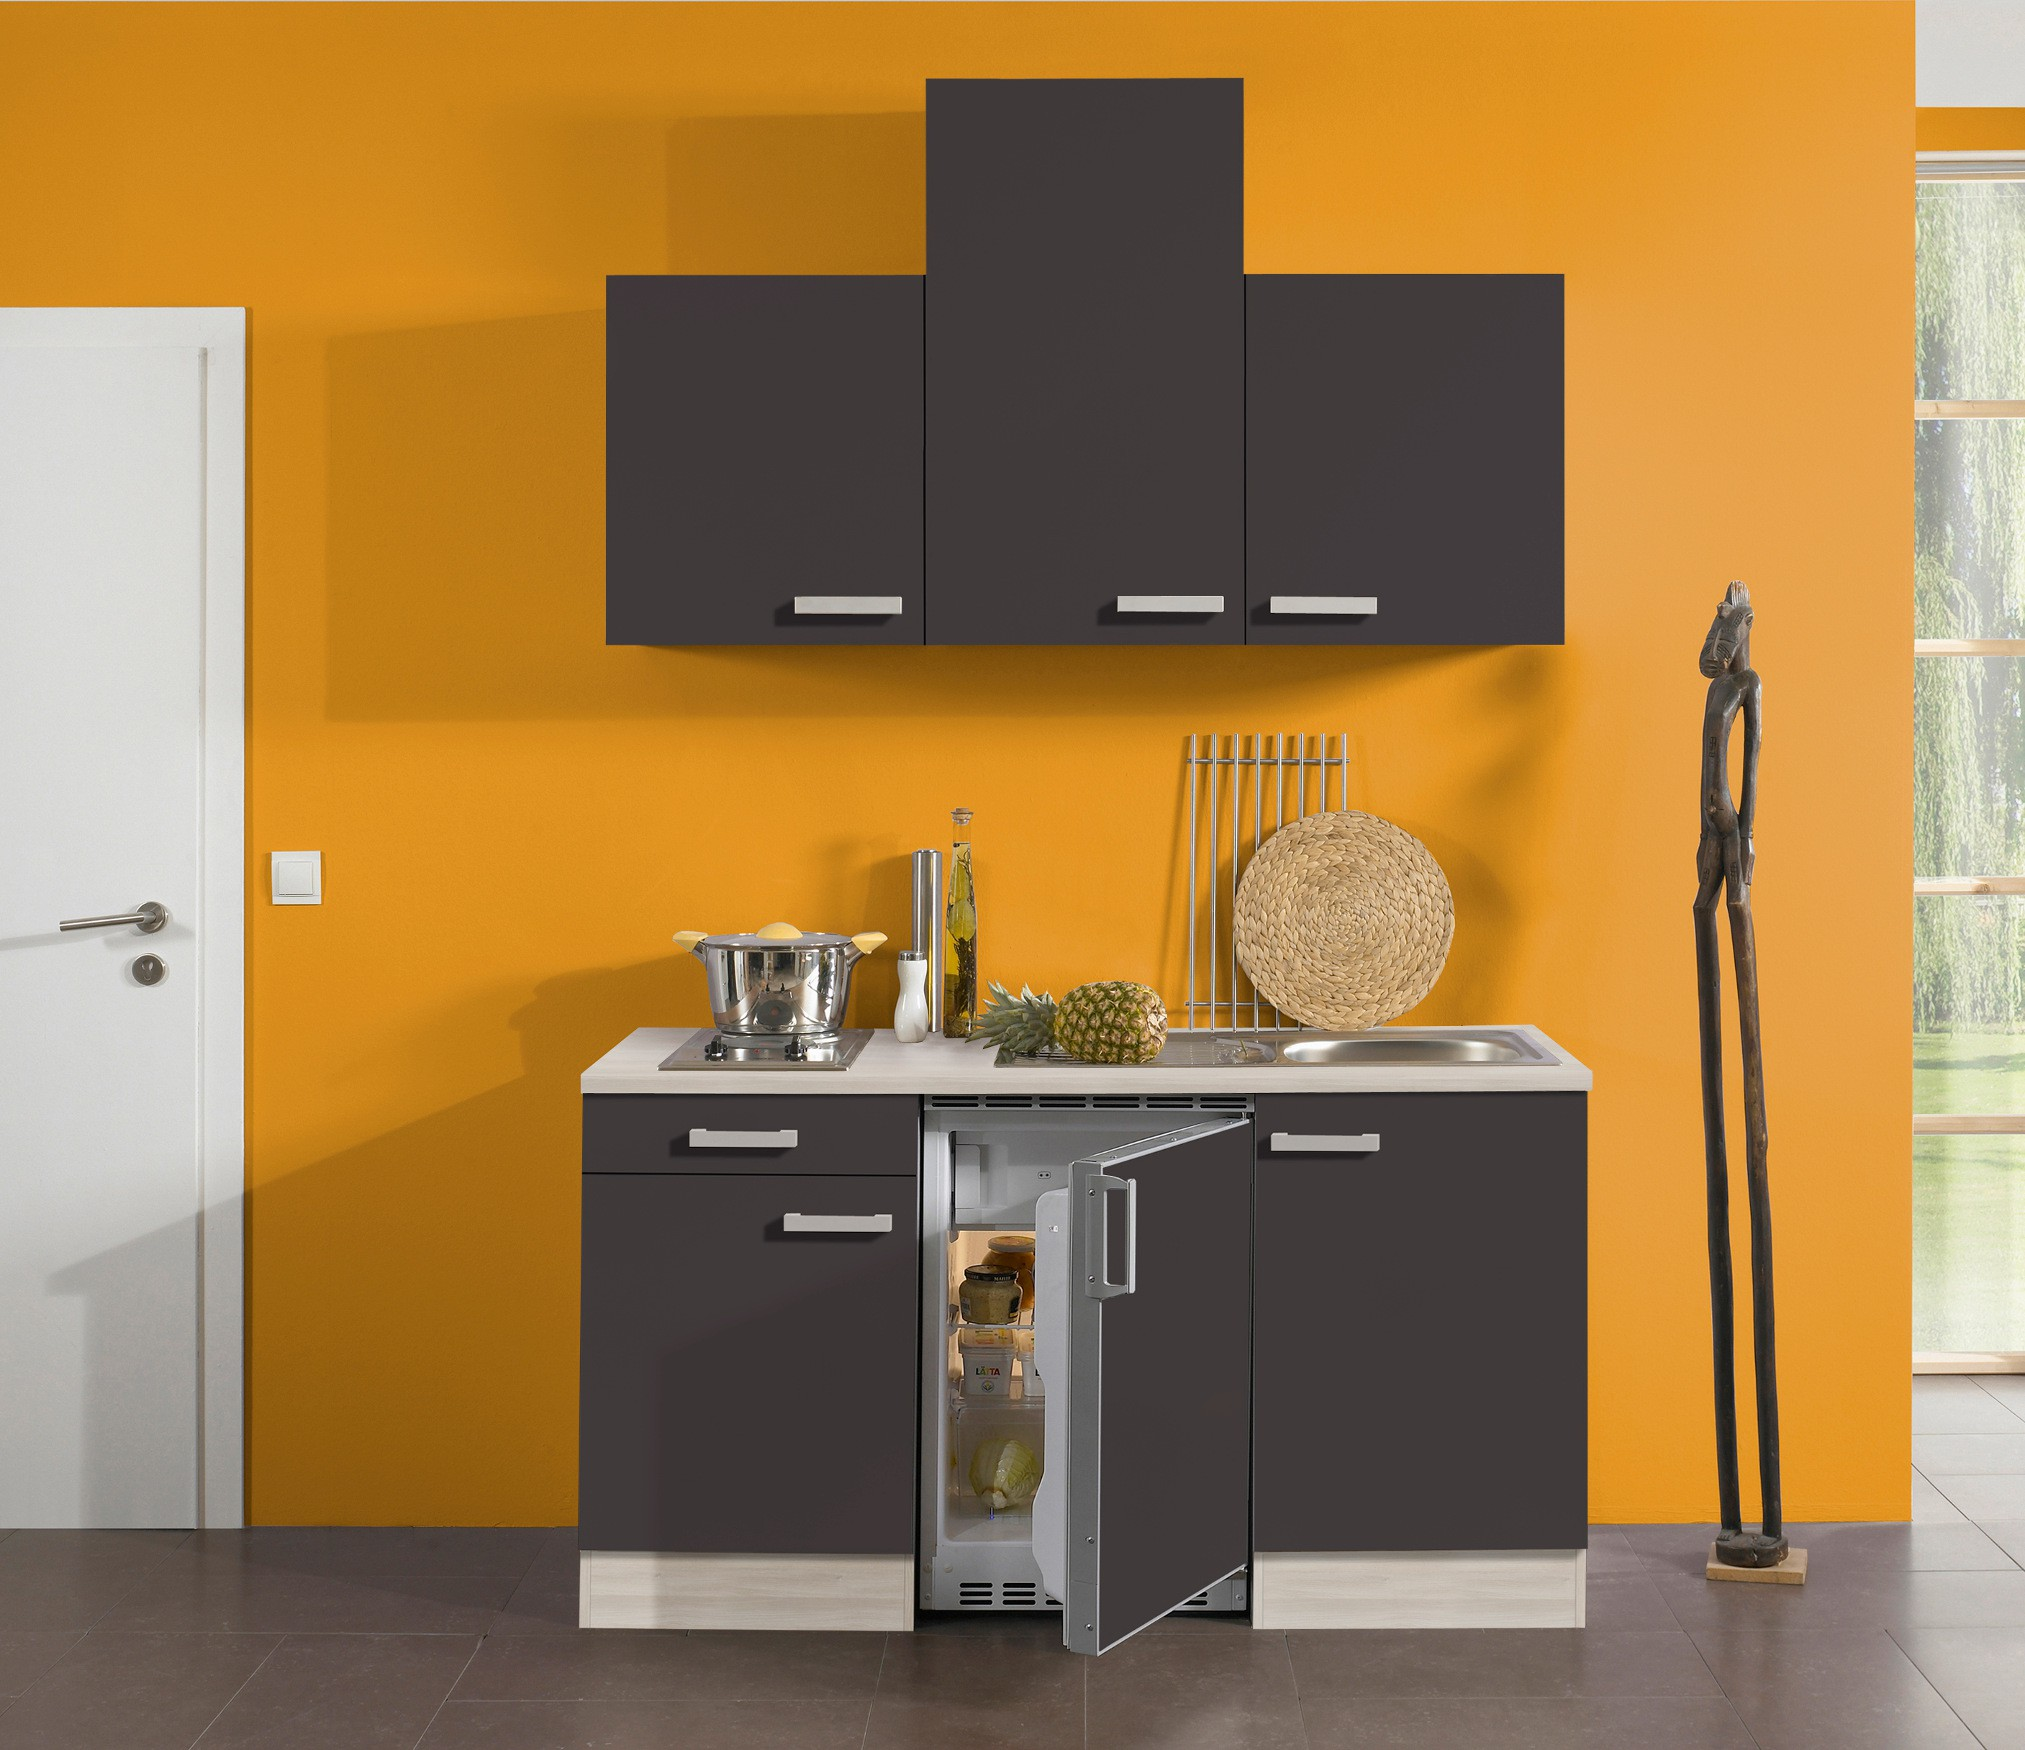 singlek che barcelona vario 2 mit elektro kochfeld breite 150 cm grau k che. Black Bedroom Furniture Sets. Home Design Ideas